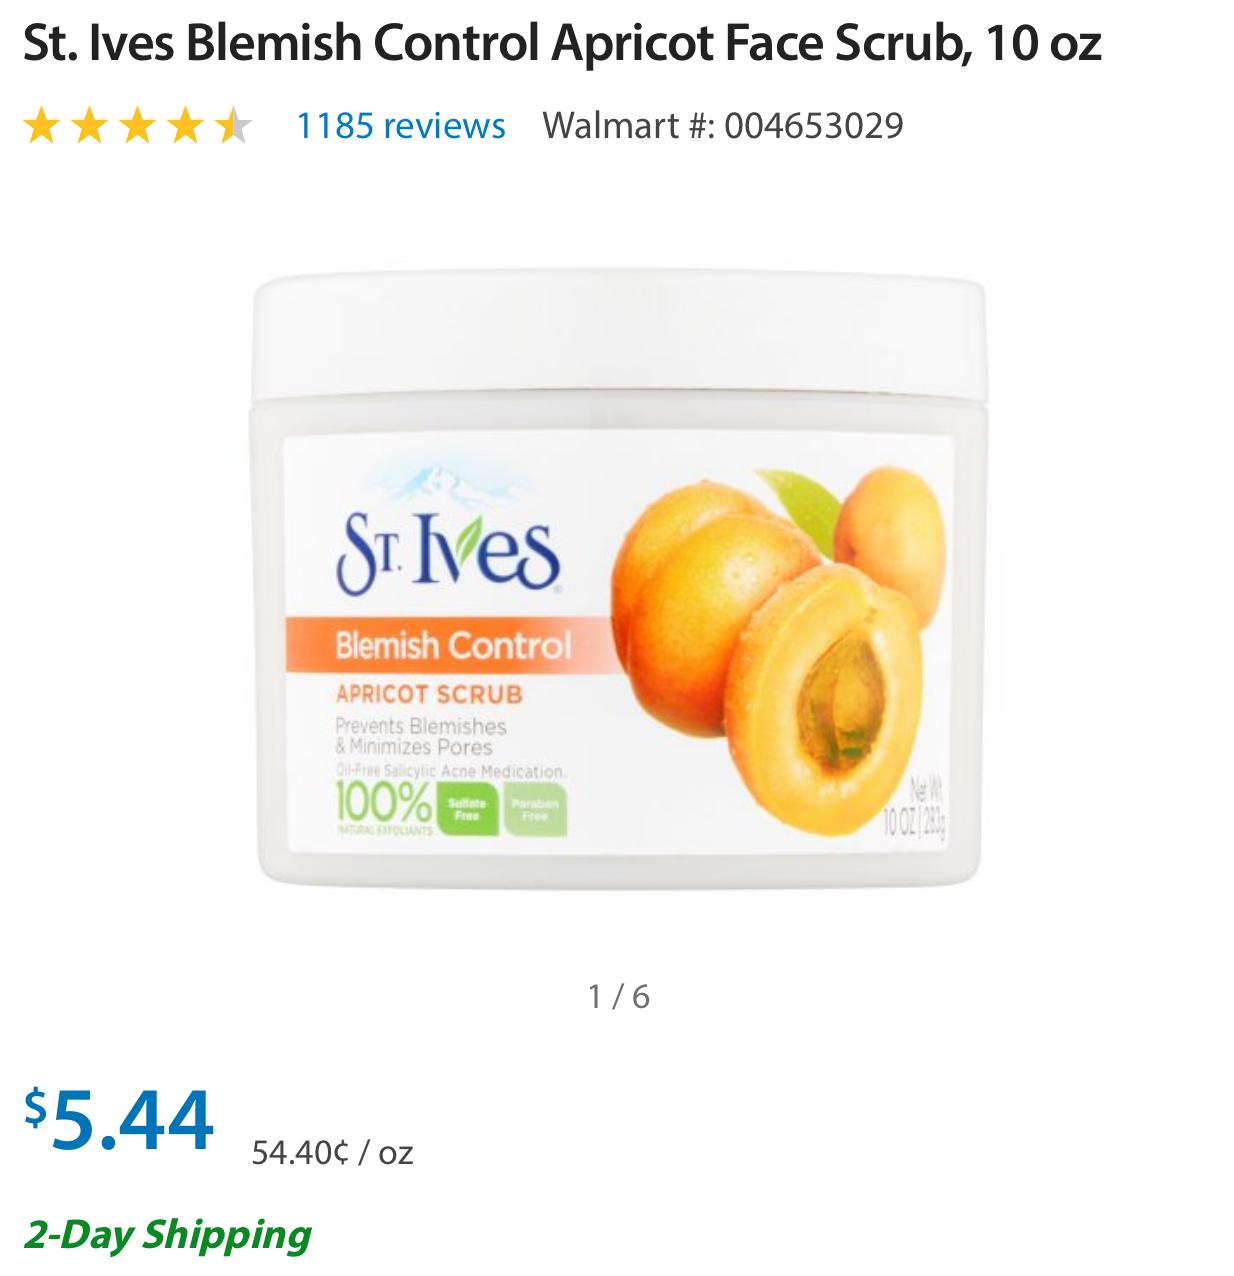 St. Ives Apricot Scrub Super Cheap Exfoliant (+ Blemish Control!)